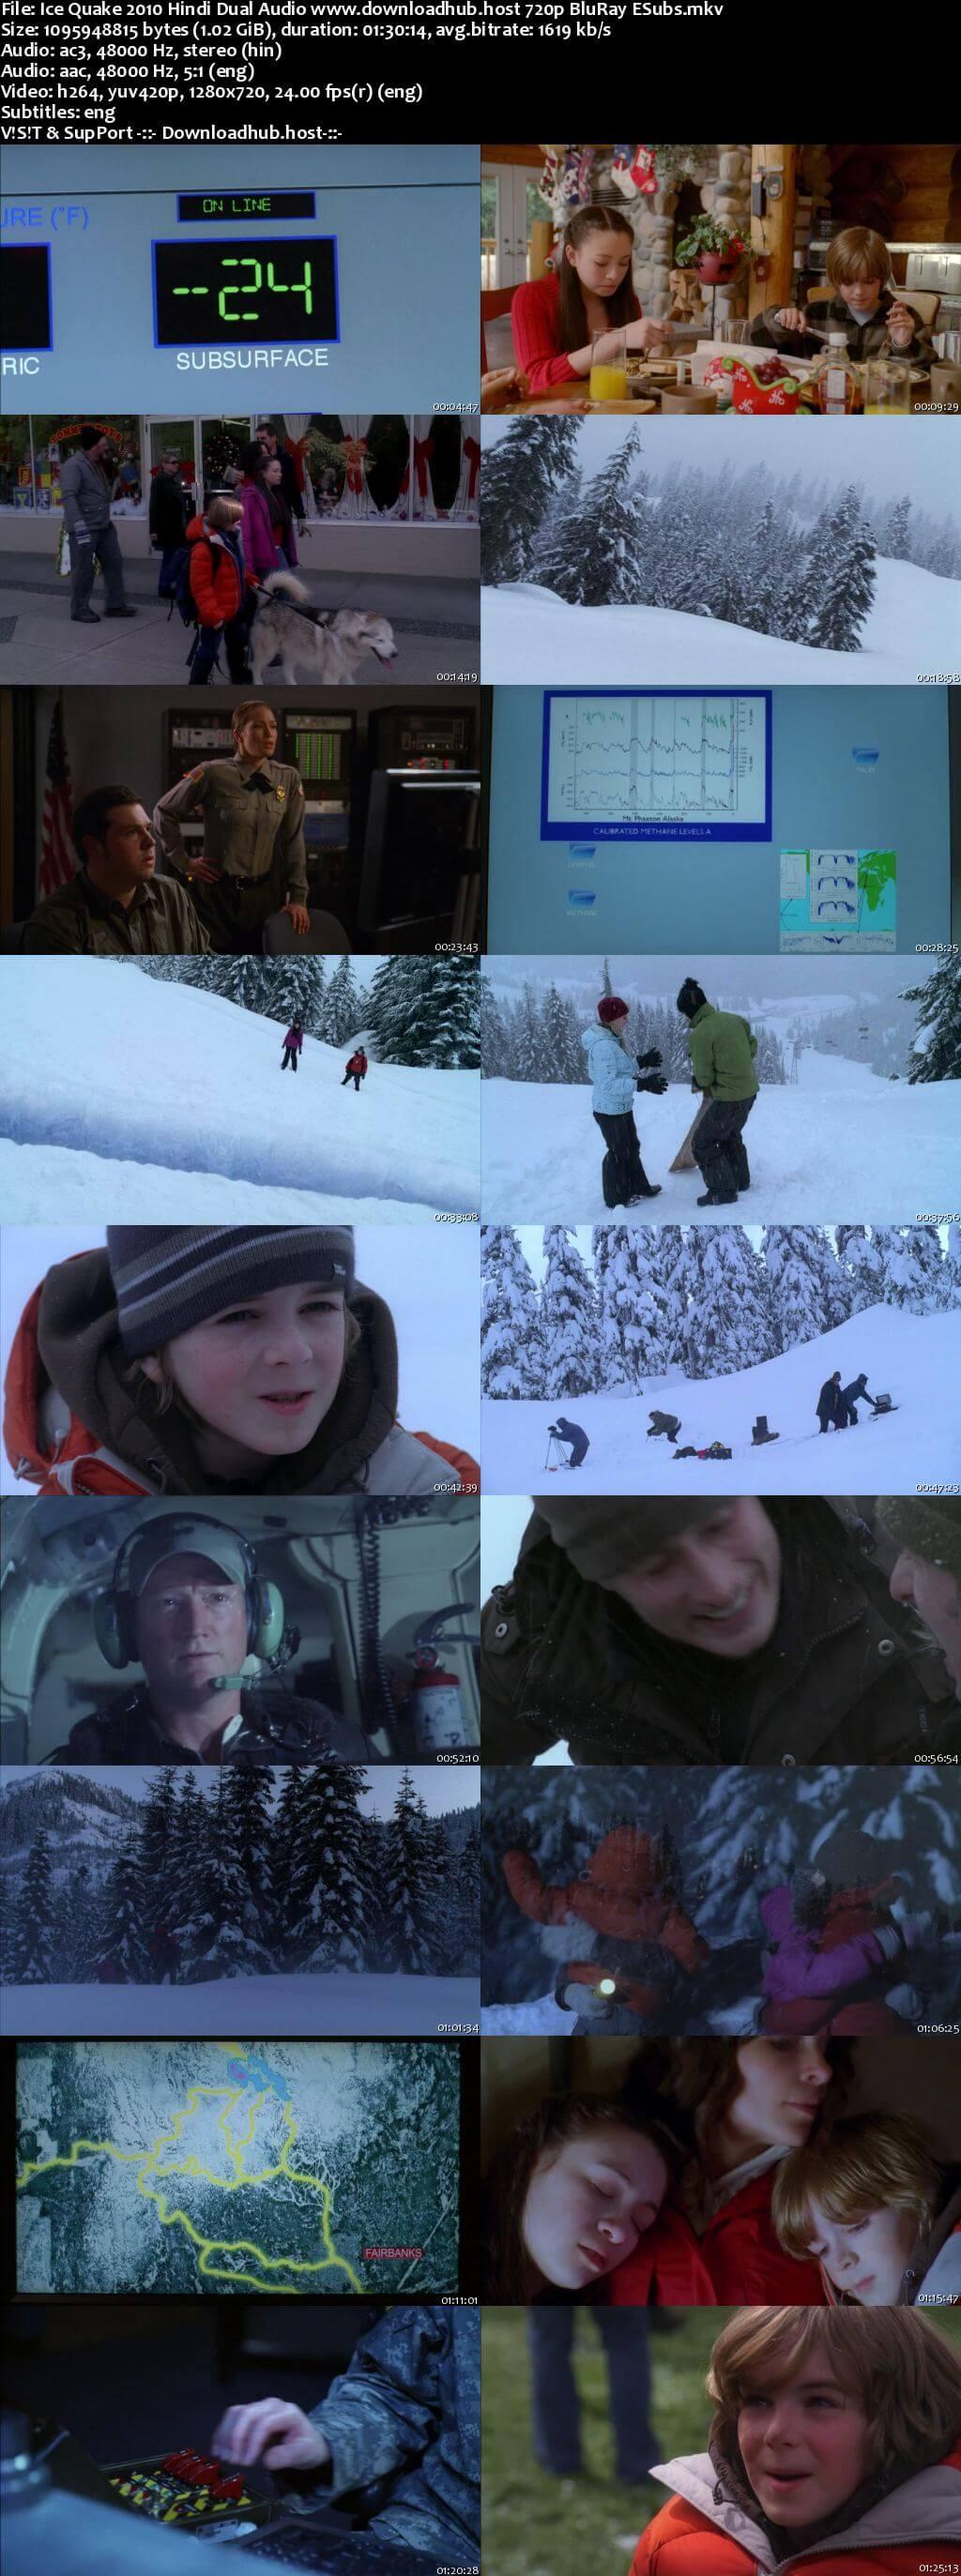 Ice Quake 2010 Hindi Dual Audio 720p BluRay ESubs